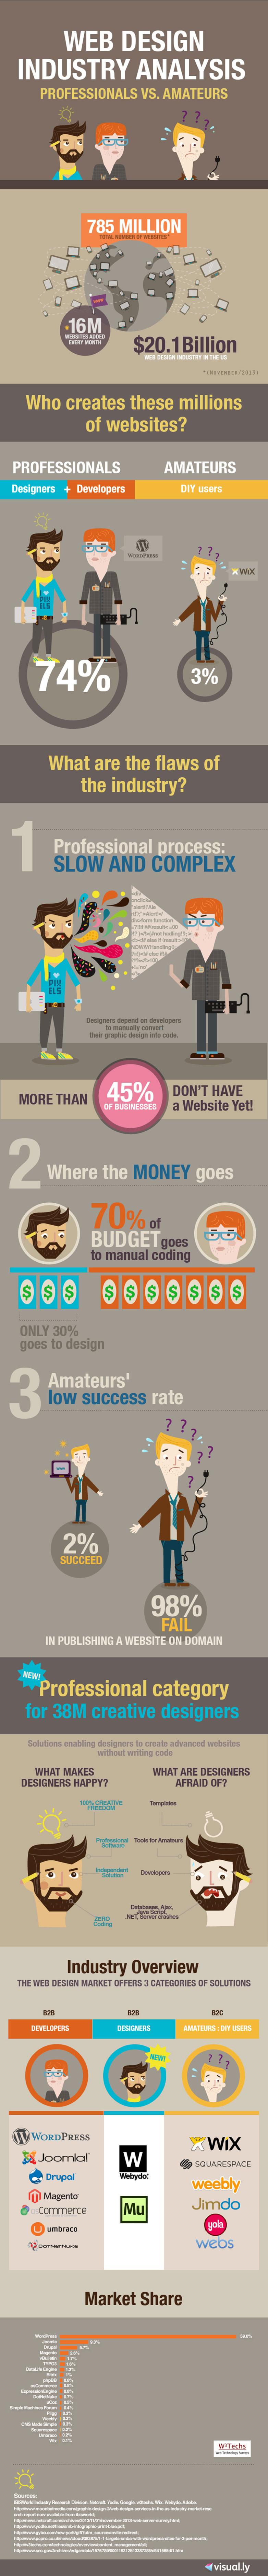 infografia diseño web profesional vs amateur